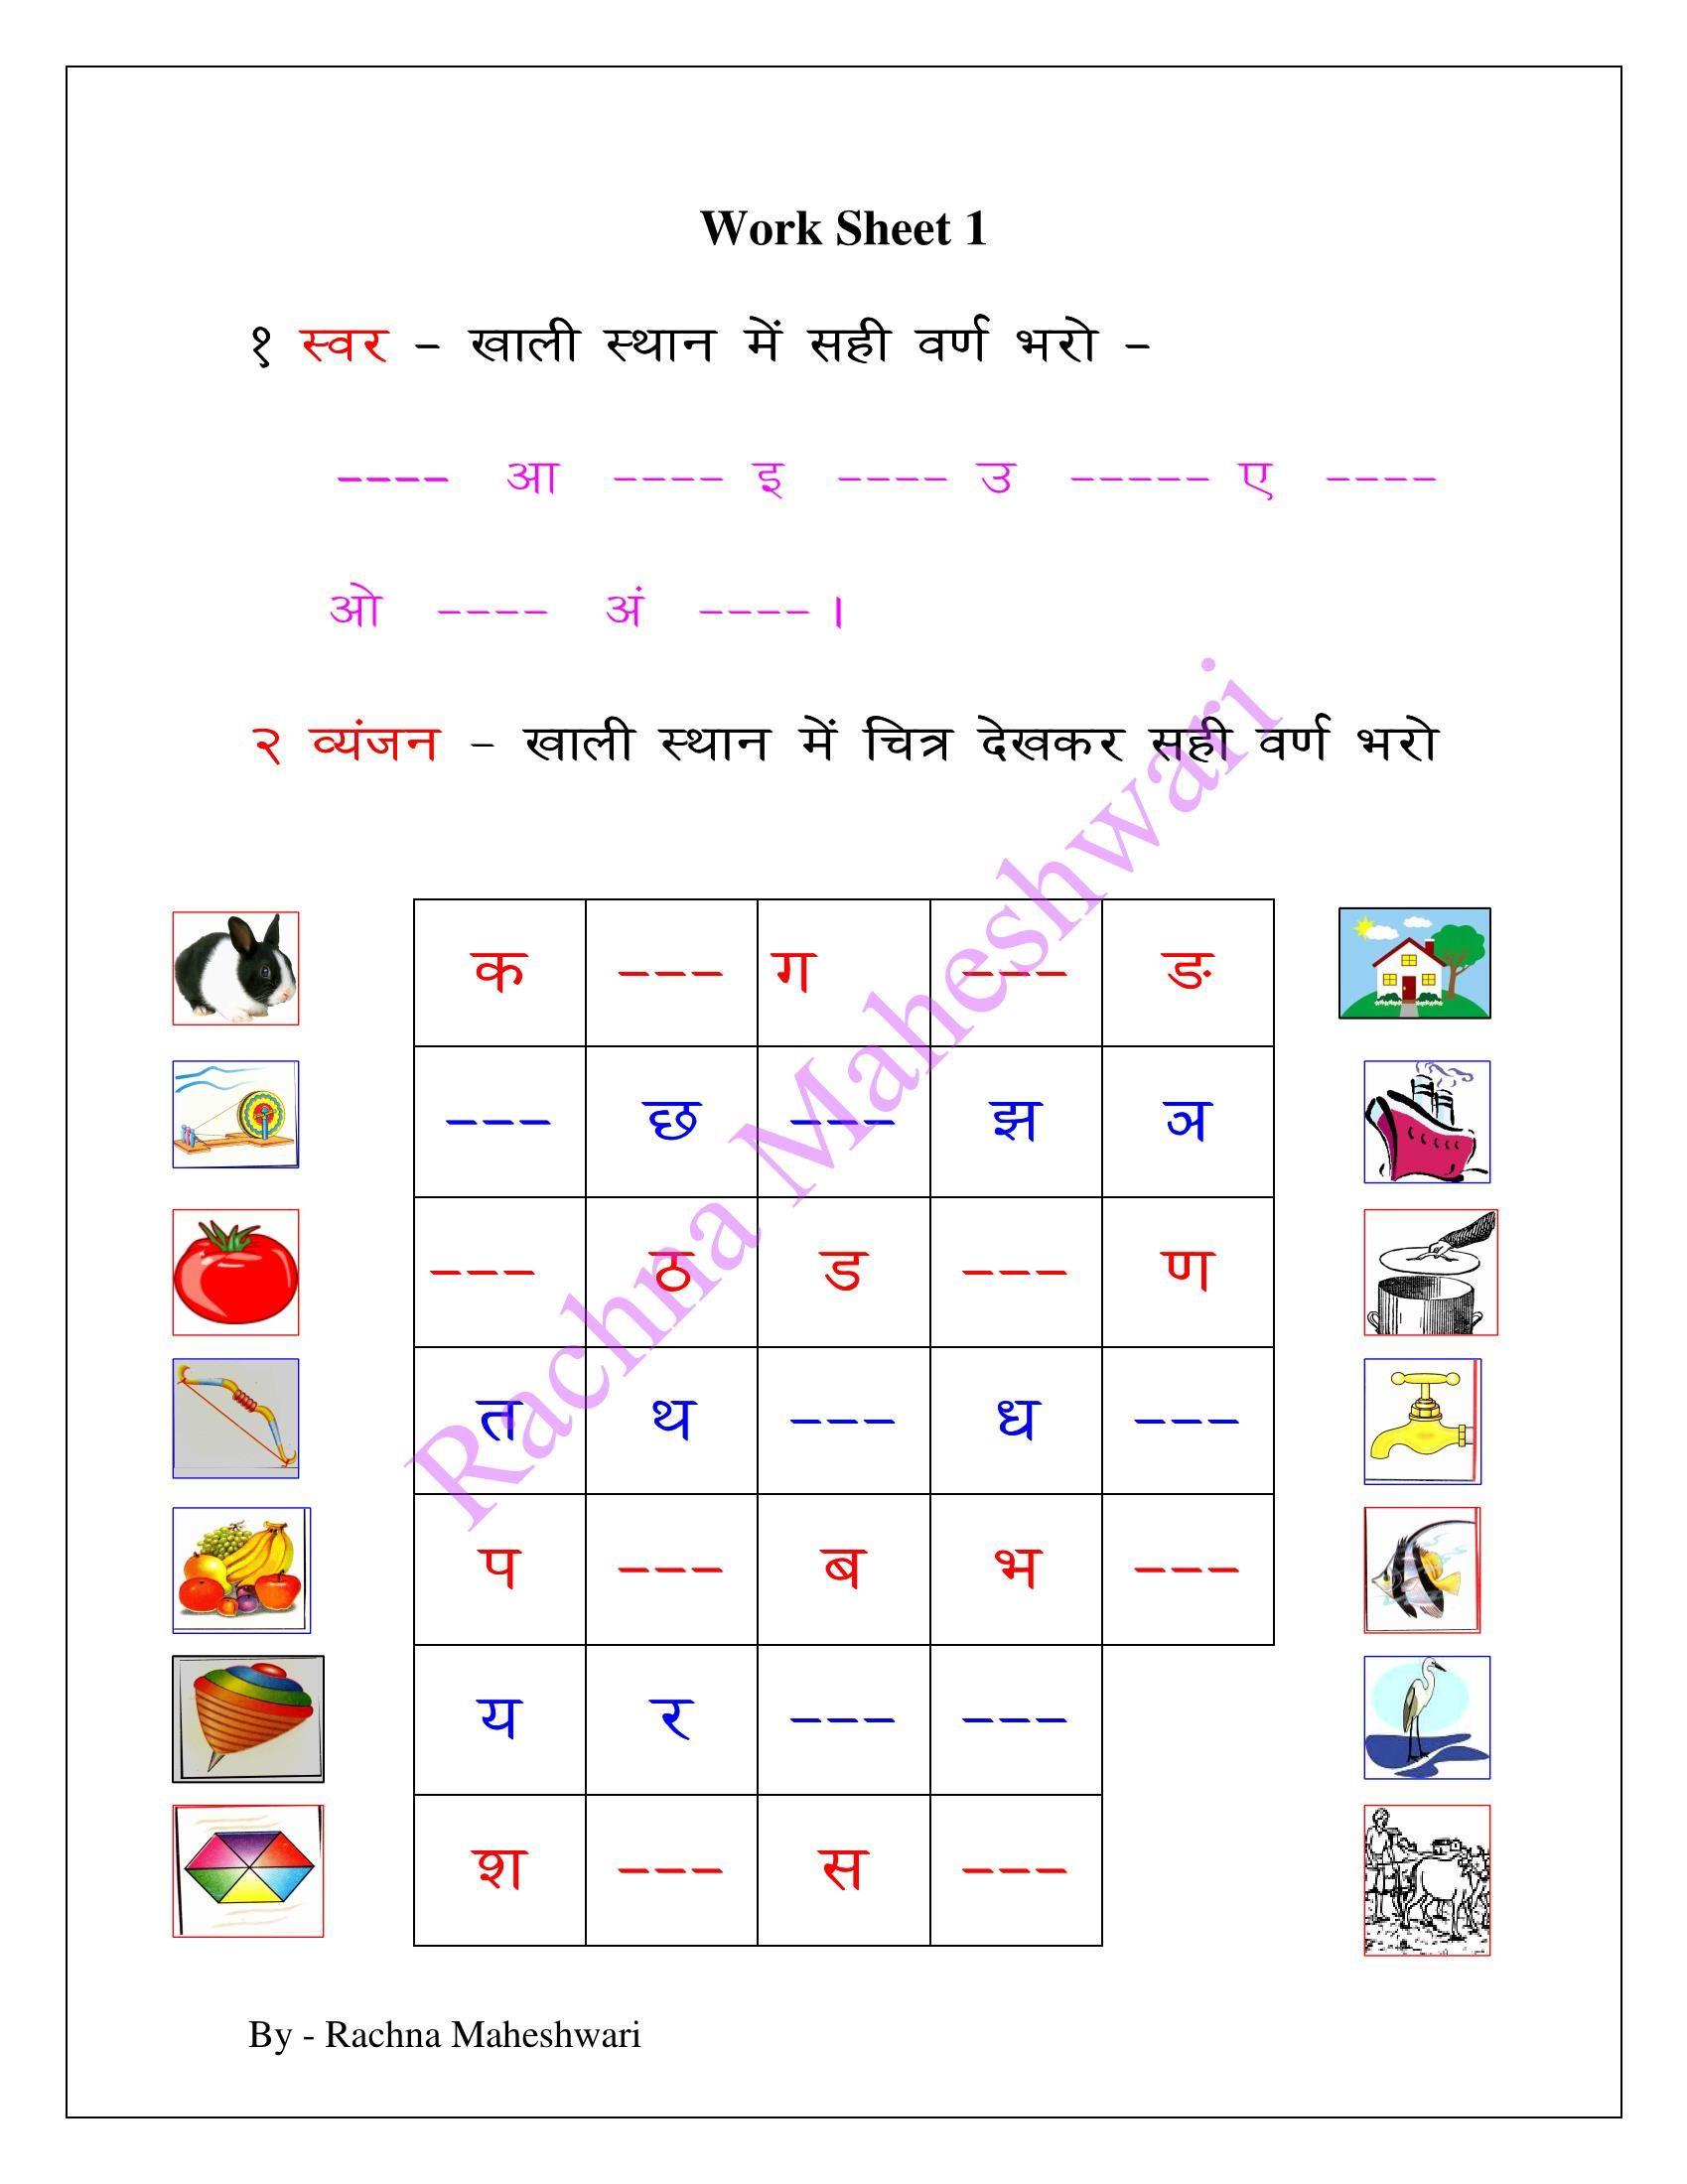 medium resolution of स्वर व्यंजन (6 Work Sheets- Easy to follow)   Hindi worksheets